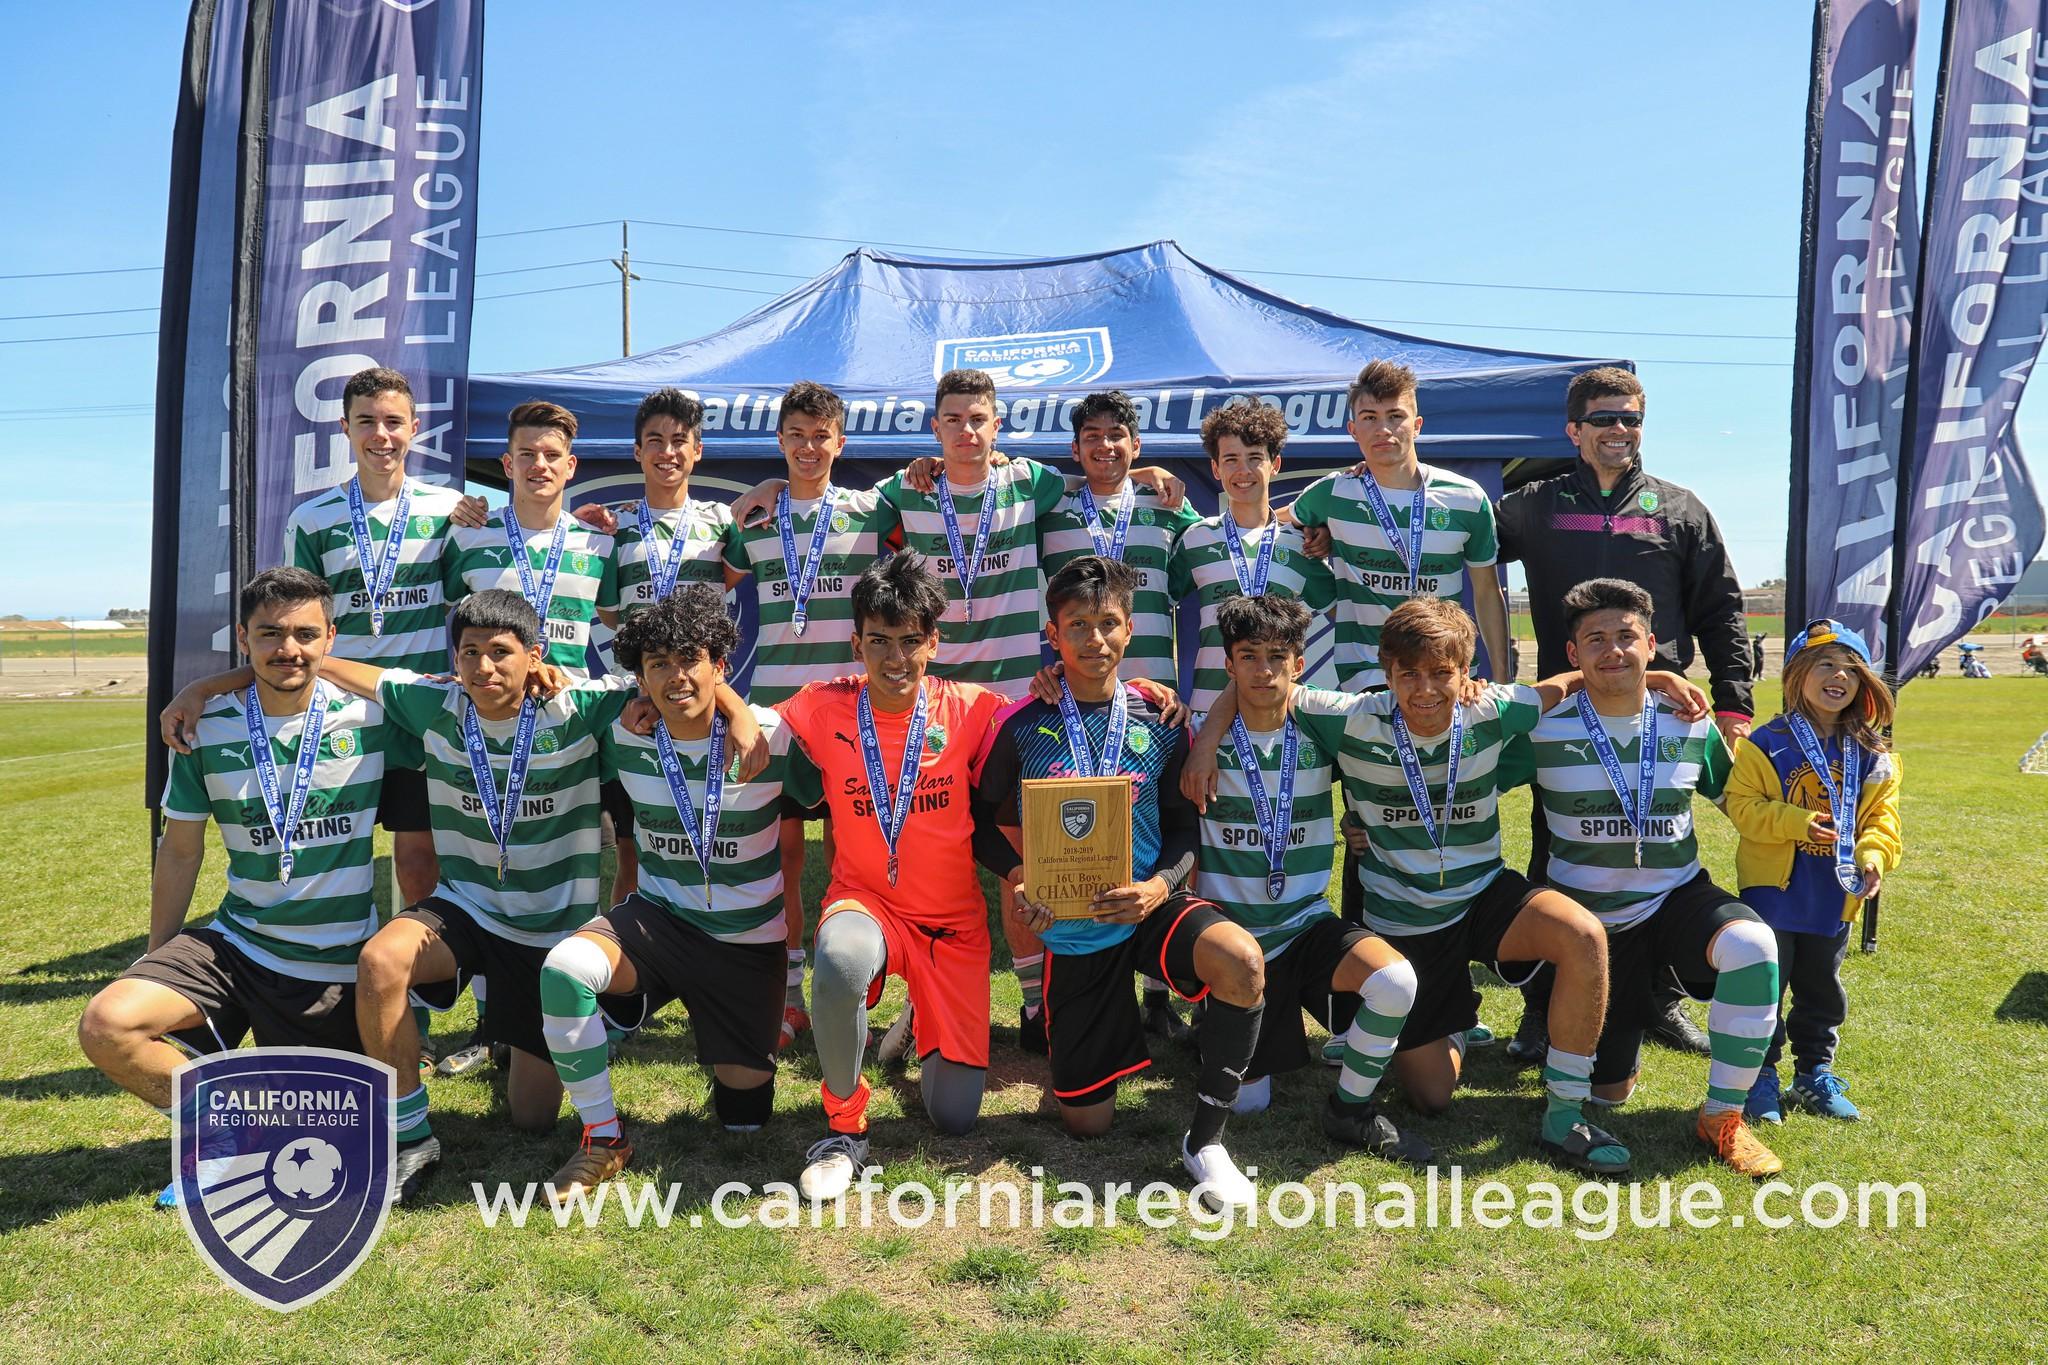 Santa Clara Sporting 03B Green